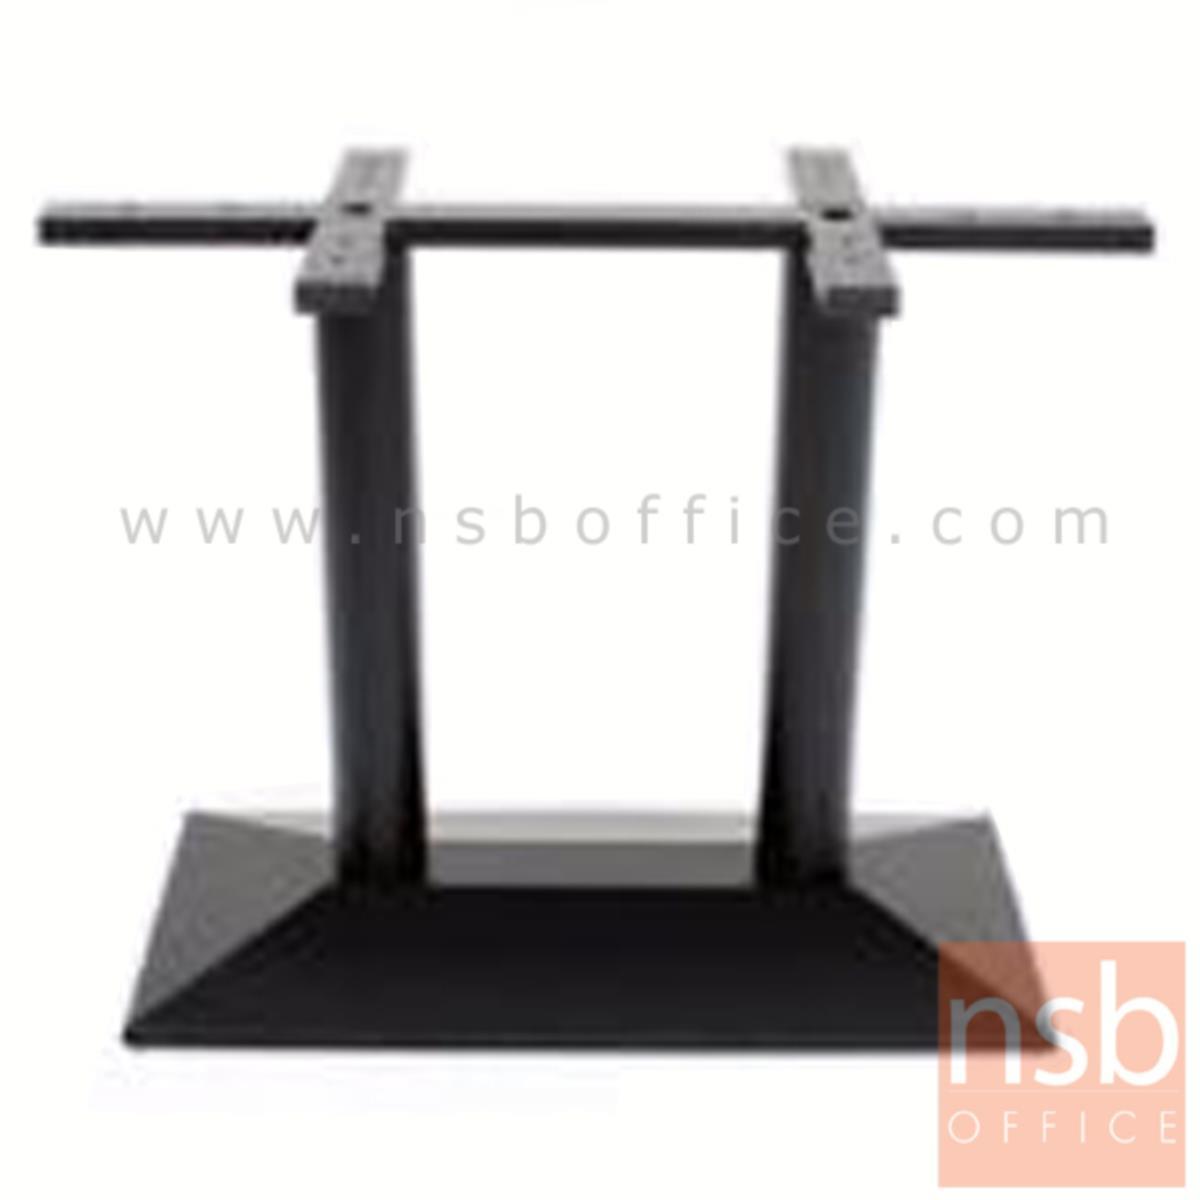 A14A214:ขาโต๊ะบาร์ รุ่น H-ICF48  ขาทรงพีระมิด